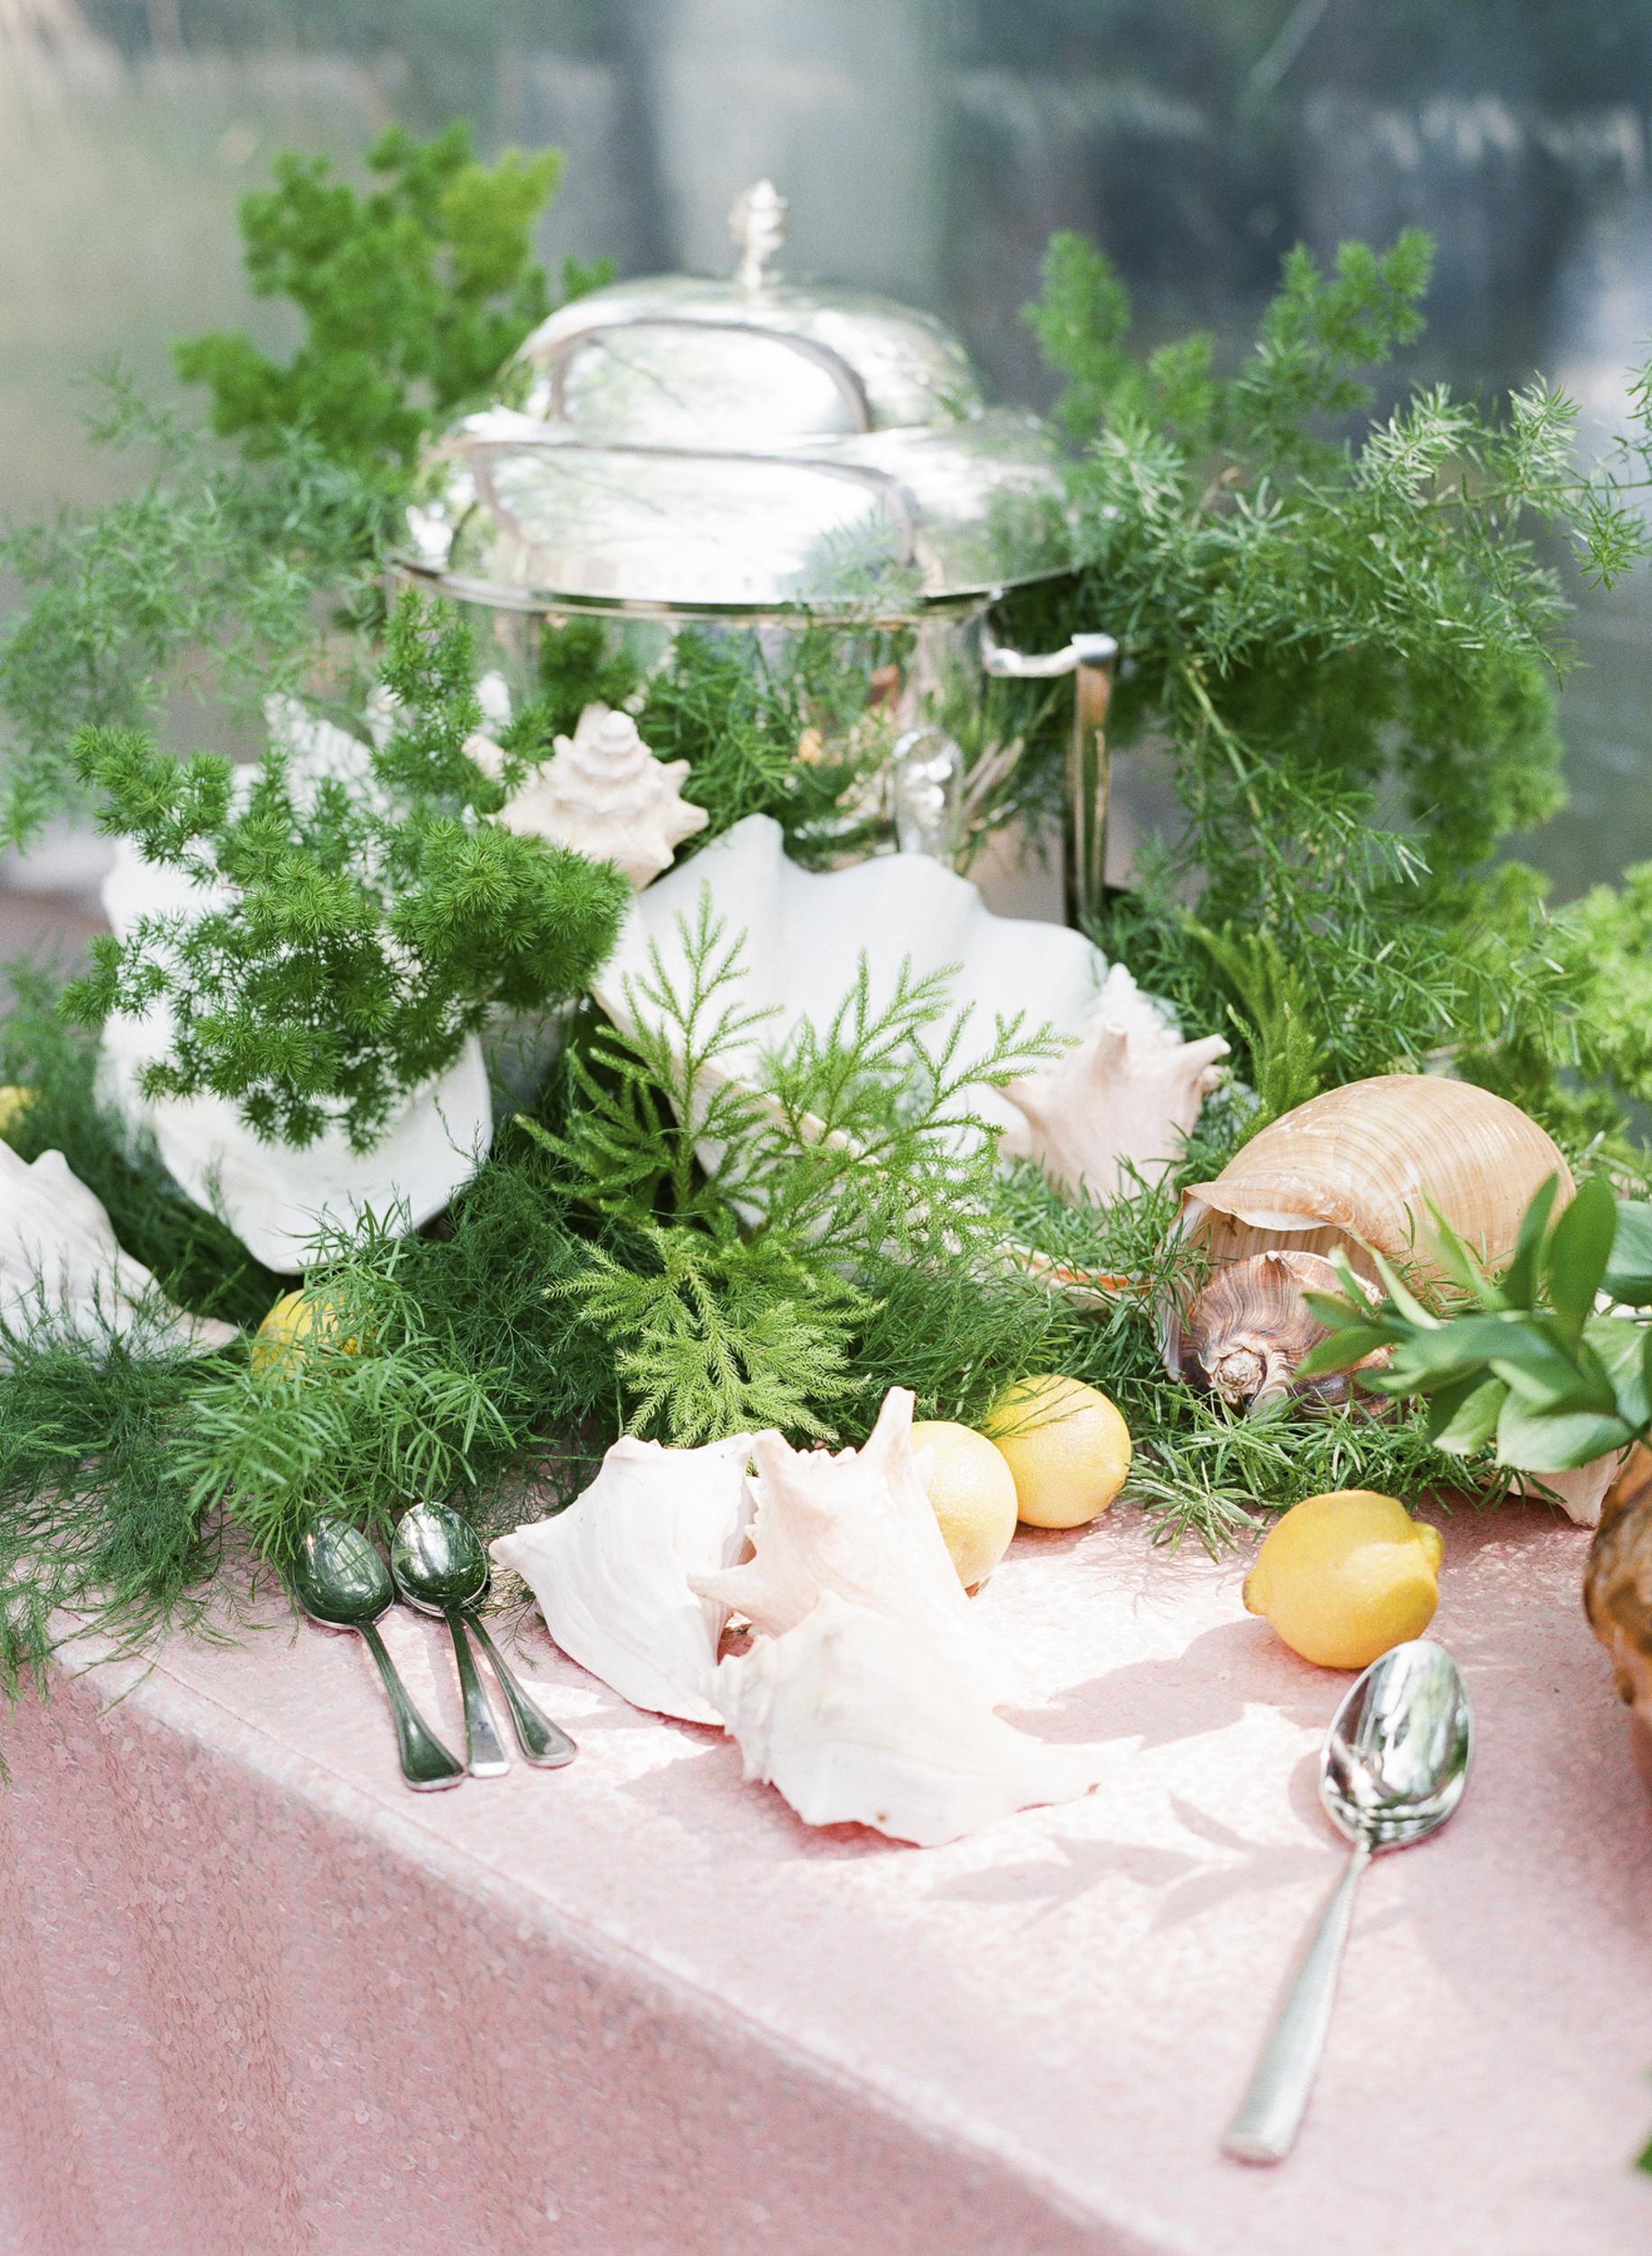 south_carolina_farm_wedding_rustic_chic_surprise_secret_luxe_wedding_bachelorette_emily_maynard_real_weddings-17.jpg